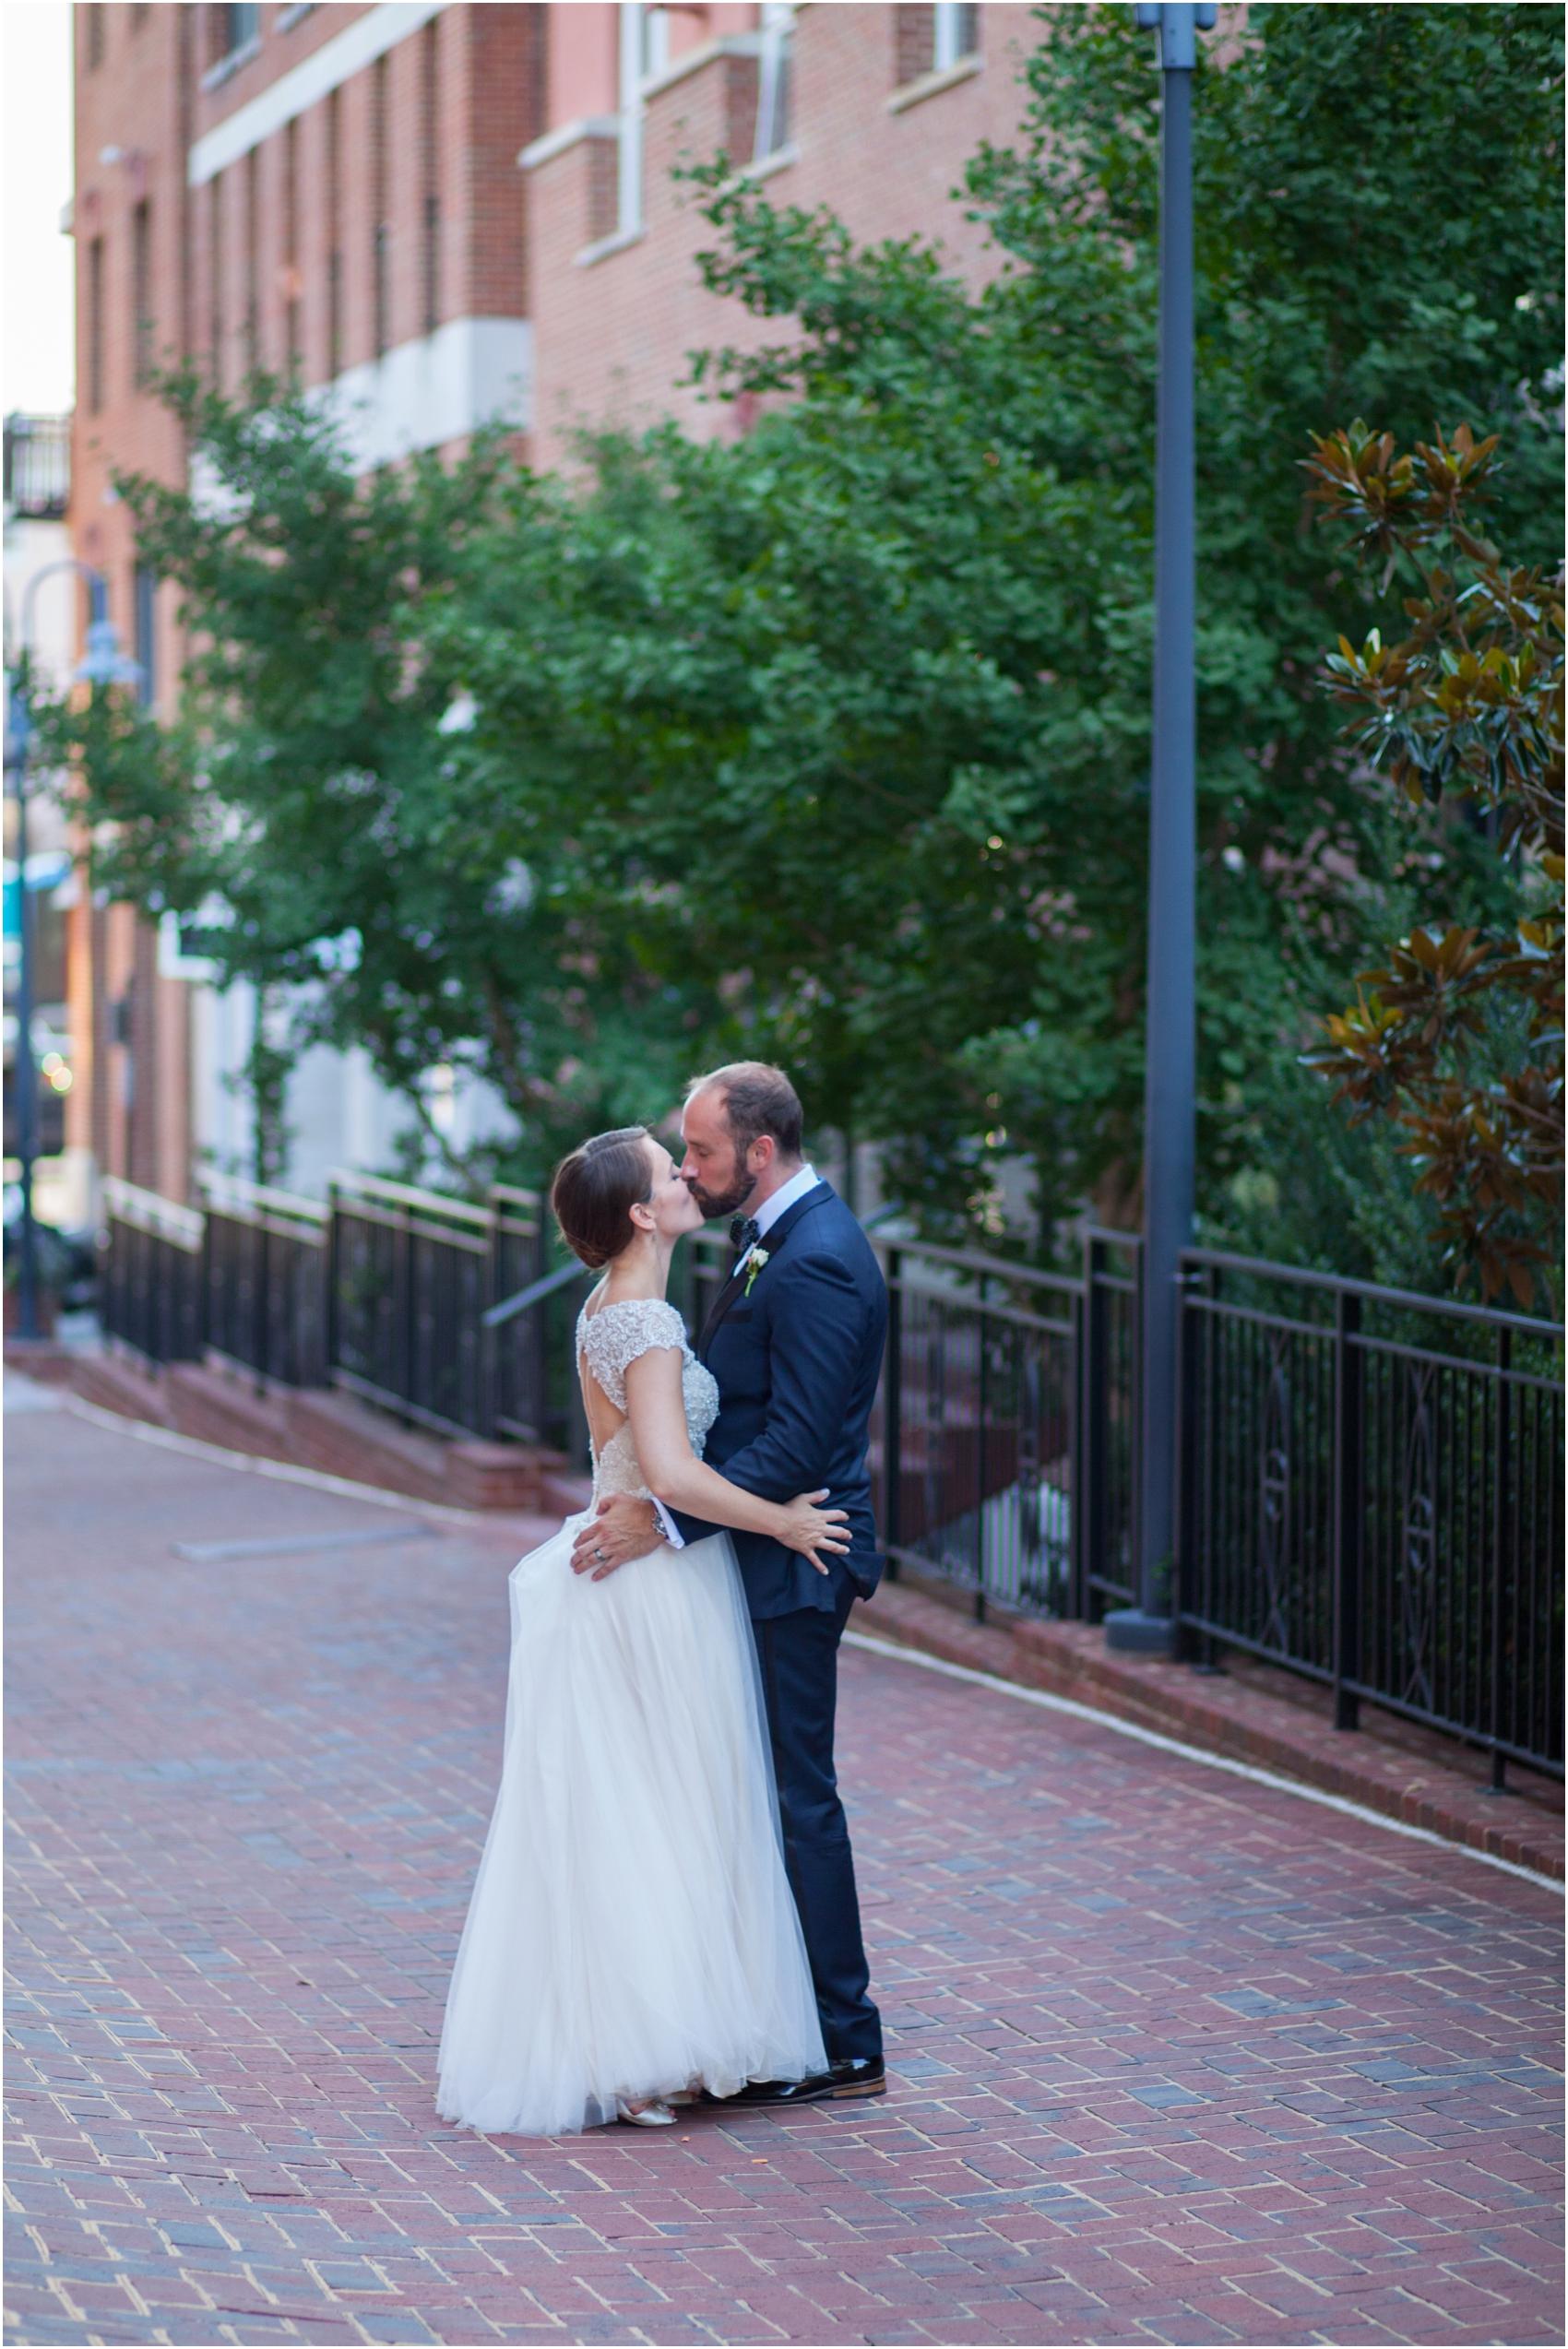 Old-Metropolitan-Hall-Wedding-Charlottesville-Virginia-2-29.jpg